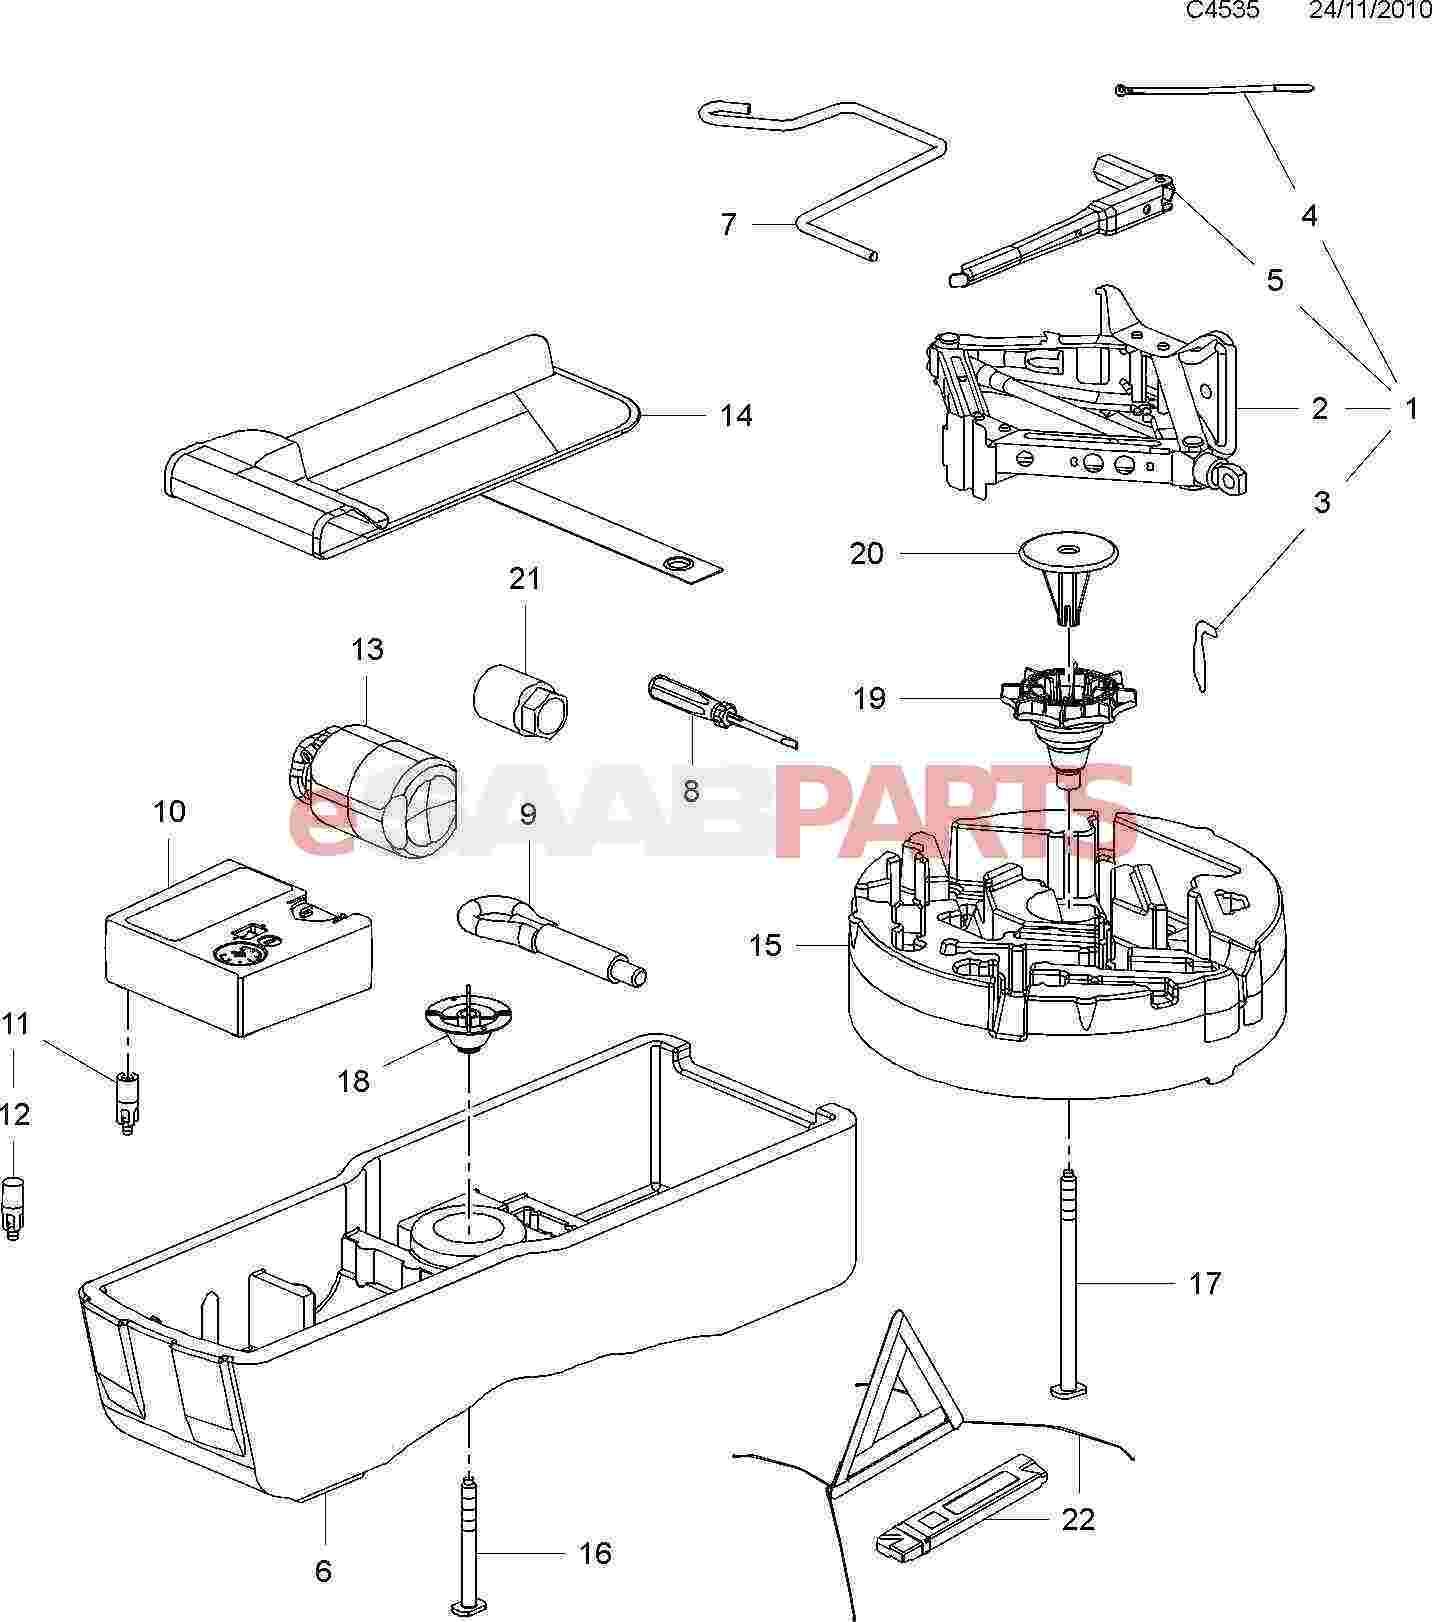 esaabparts saab 9 5 650 accessories fluids parts Buick Grand National Crate Engine esaabparts saab 9 5 650 accessories fluids parts accessories tool kit